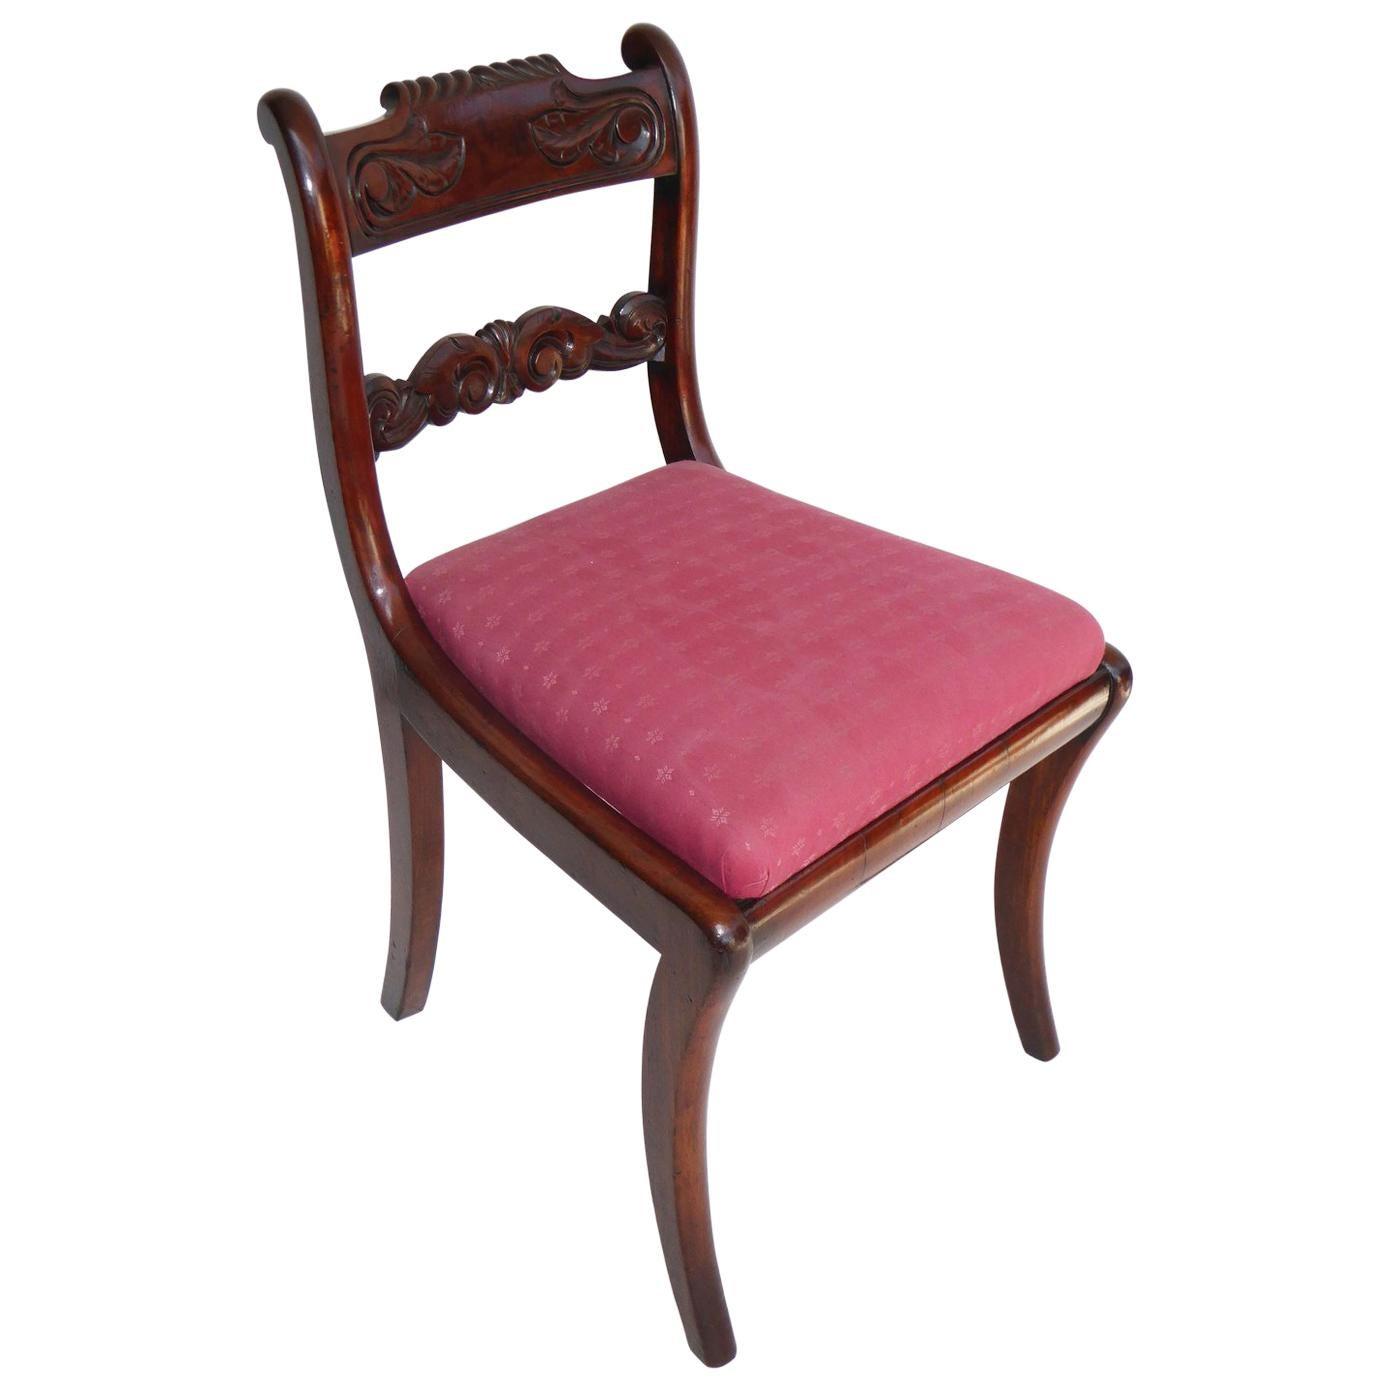 Set of 8 19th Century Regency Mahogany Dining Chairs